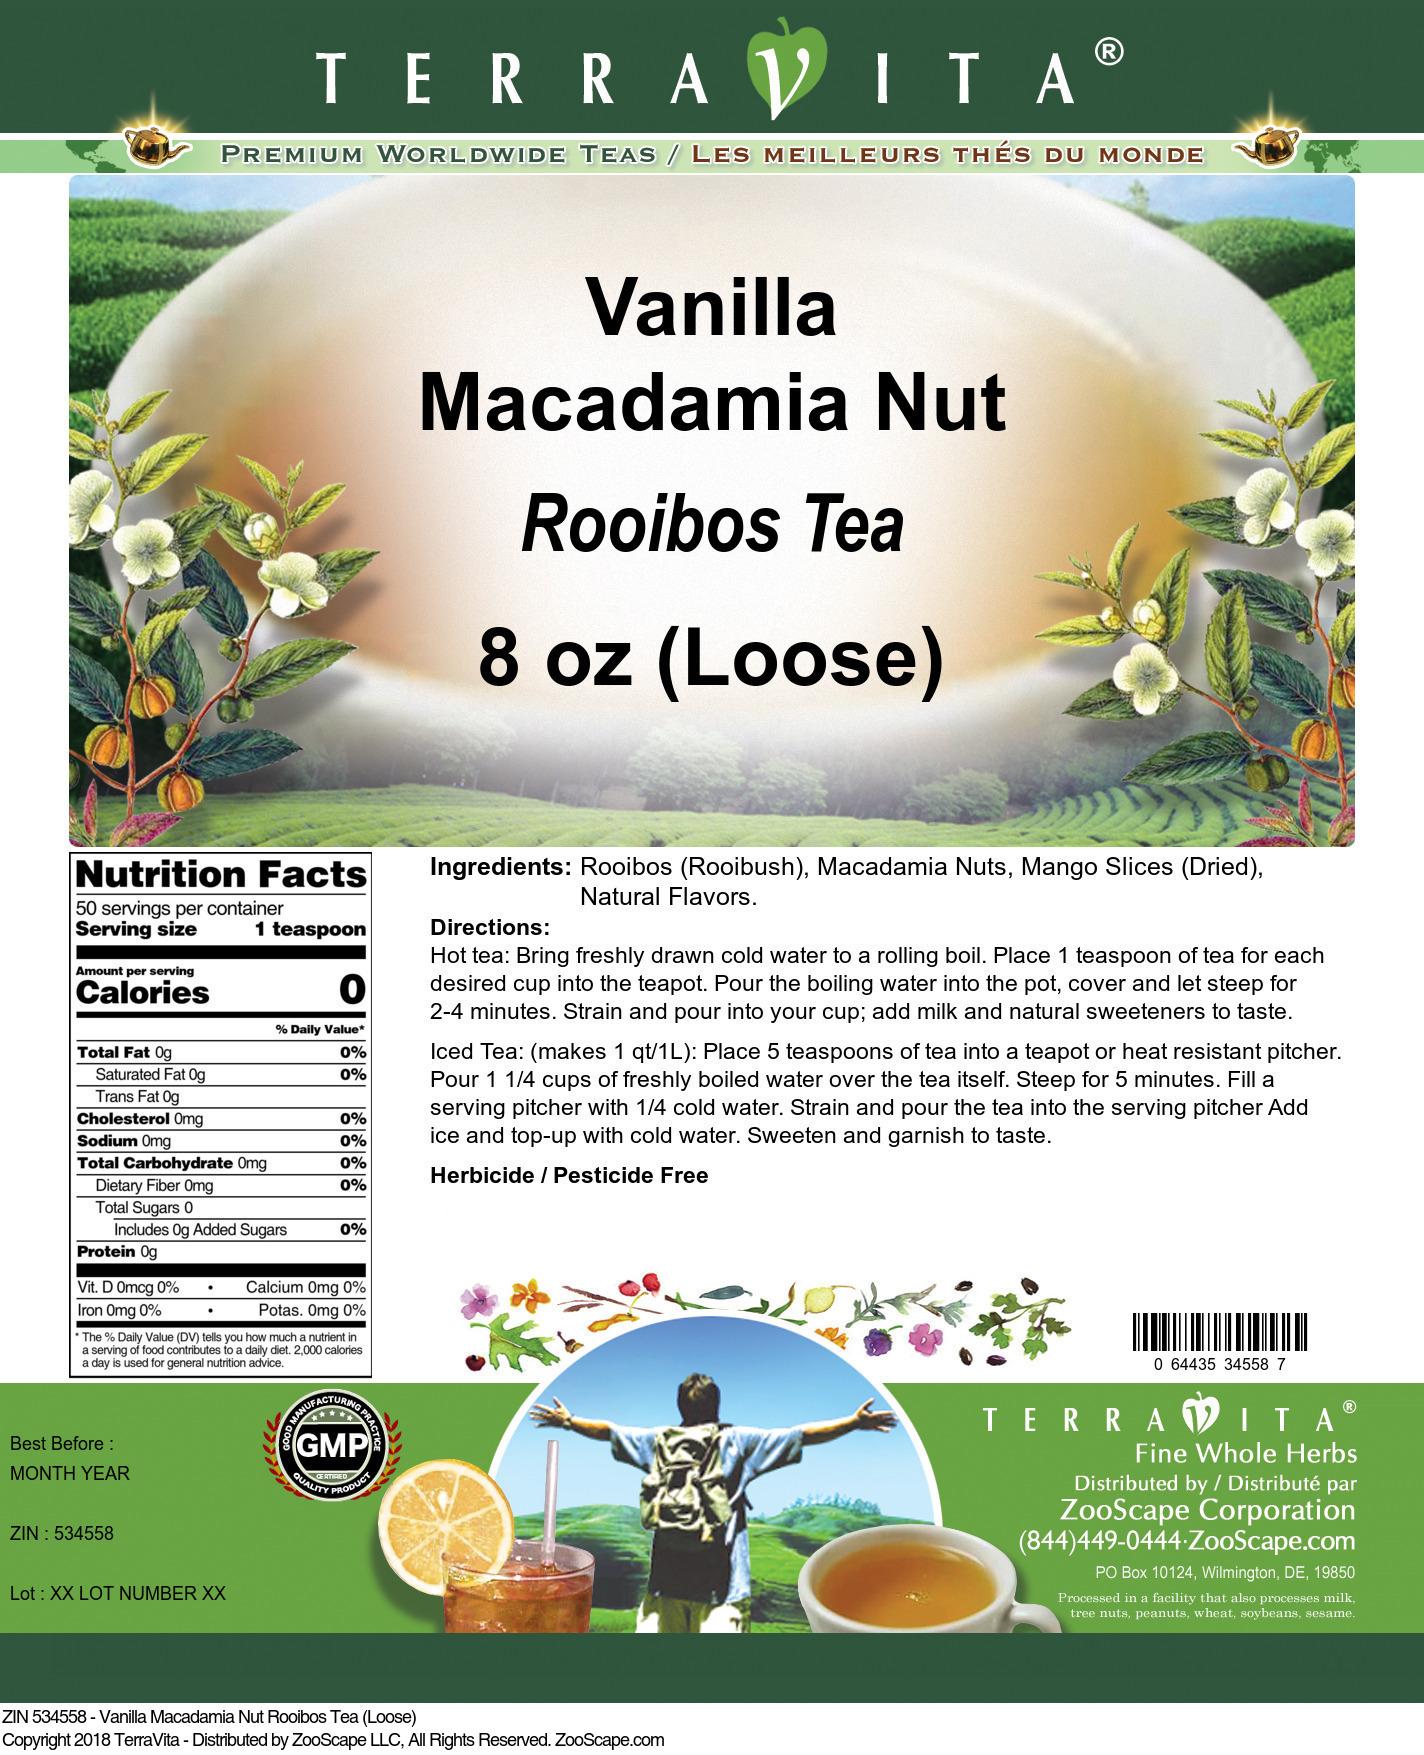 Vanilla Macadamia Nut Rooibos Tea